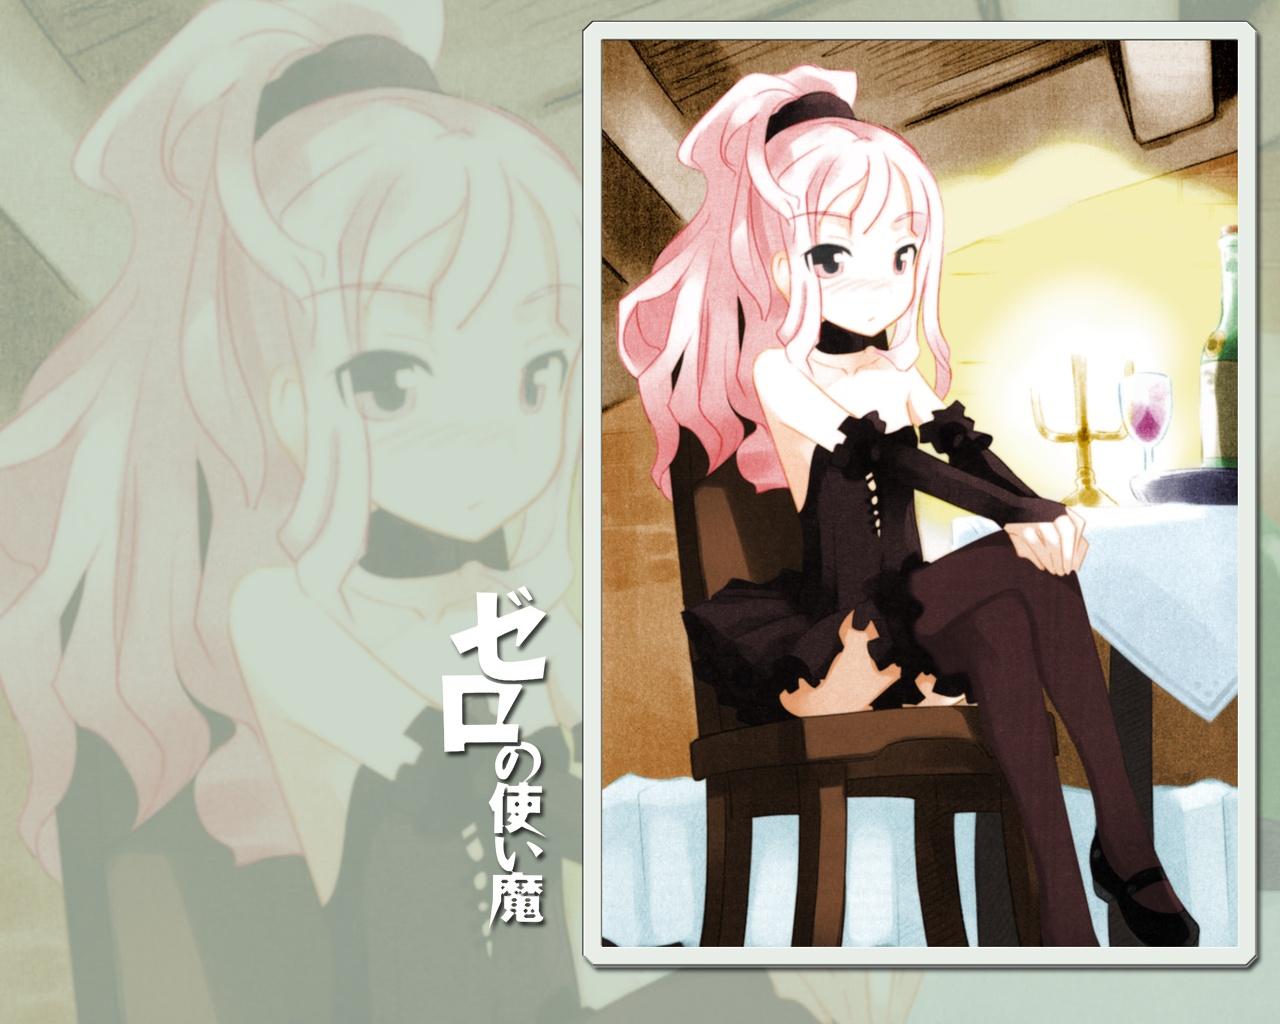 zeroNoTsukaimaSaison3_wallpaper_5894.jpg